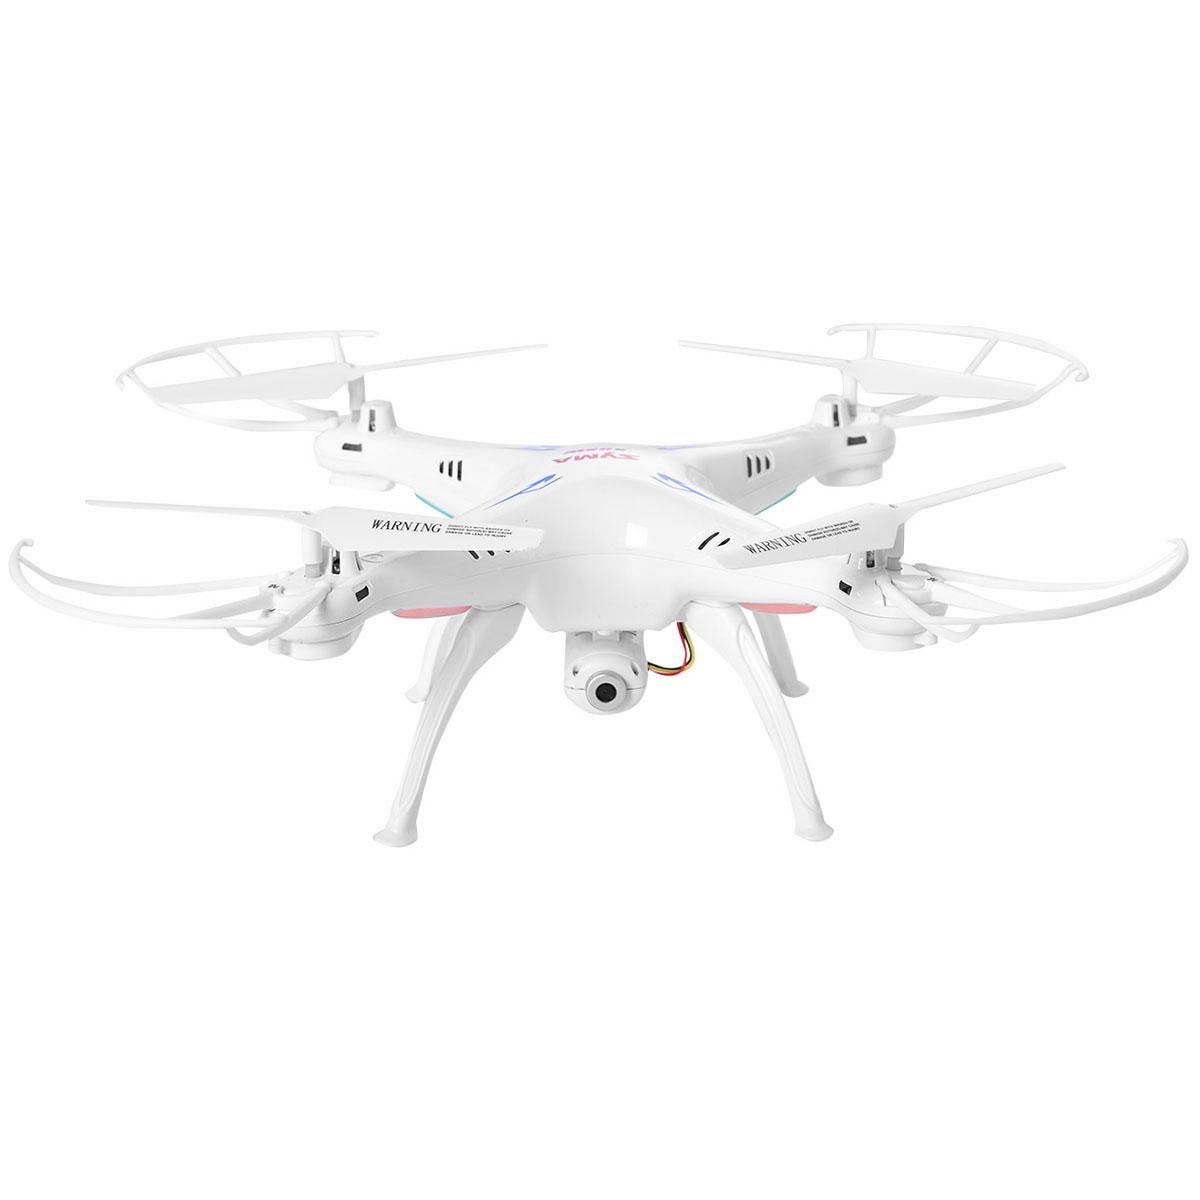 Syma X5SW WIFI FPV 2.4 GHz 4CH 6-Axis RC Quadcopter